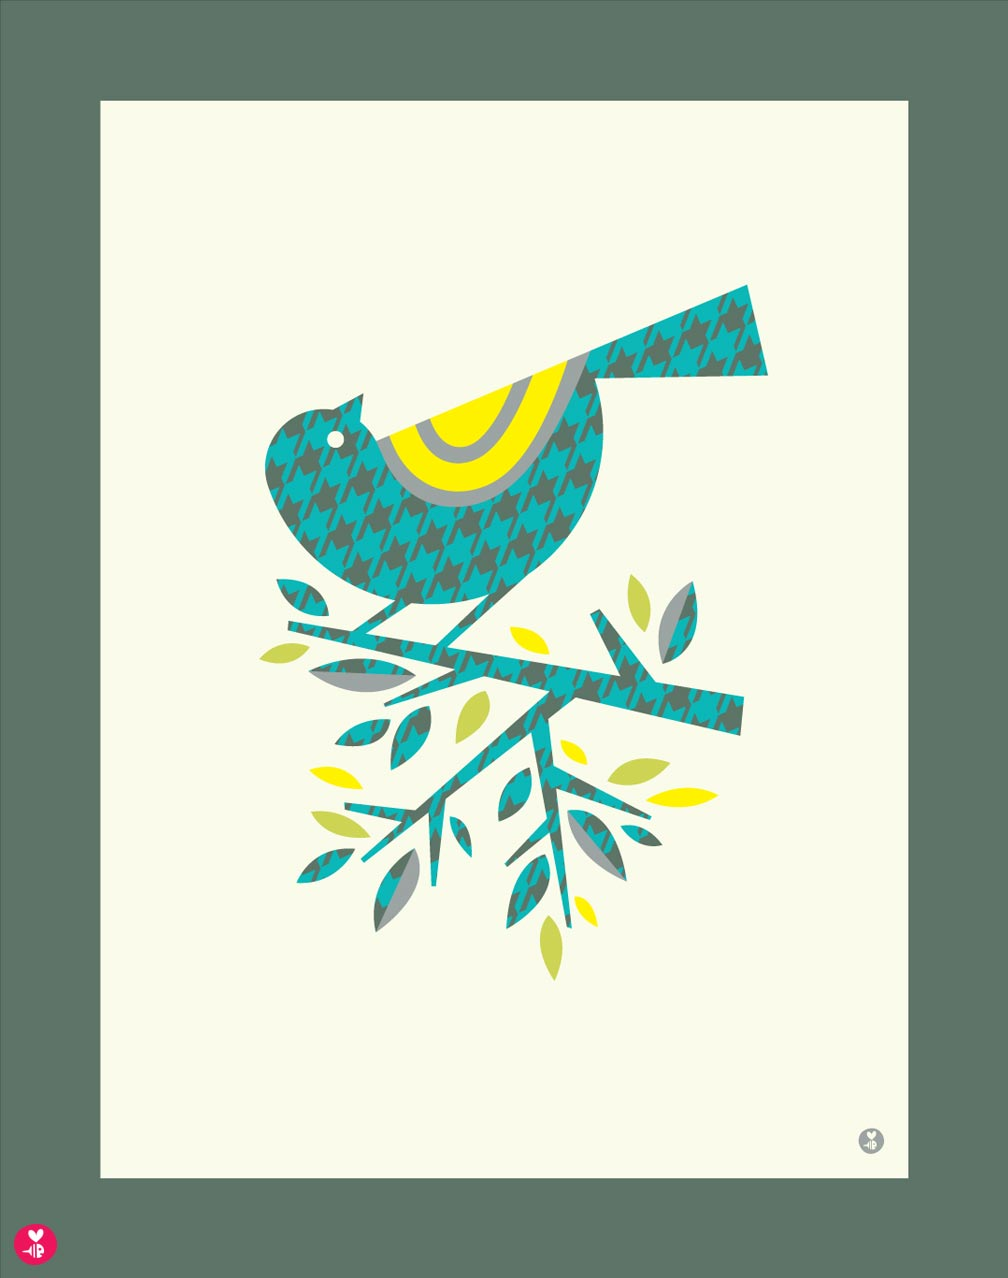 Houndstooth WarblerLimited Edition Print